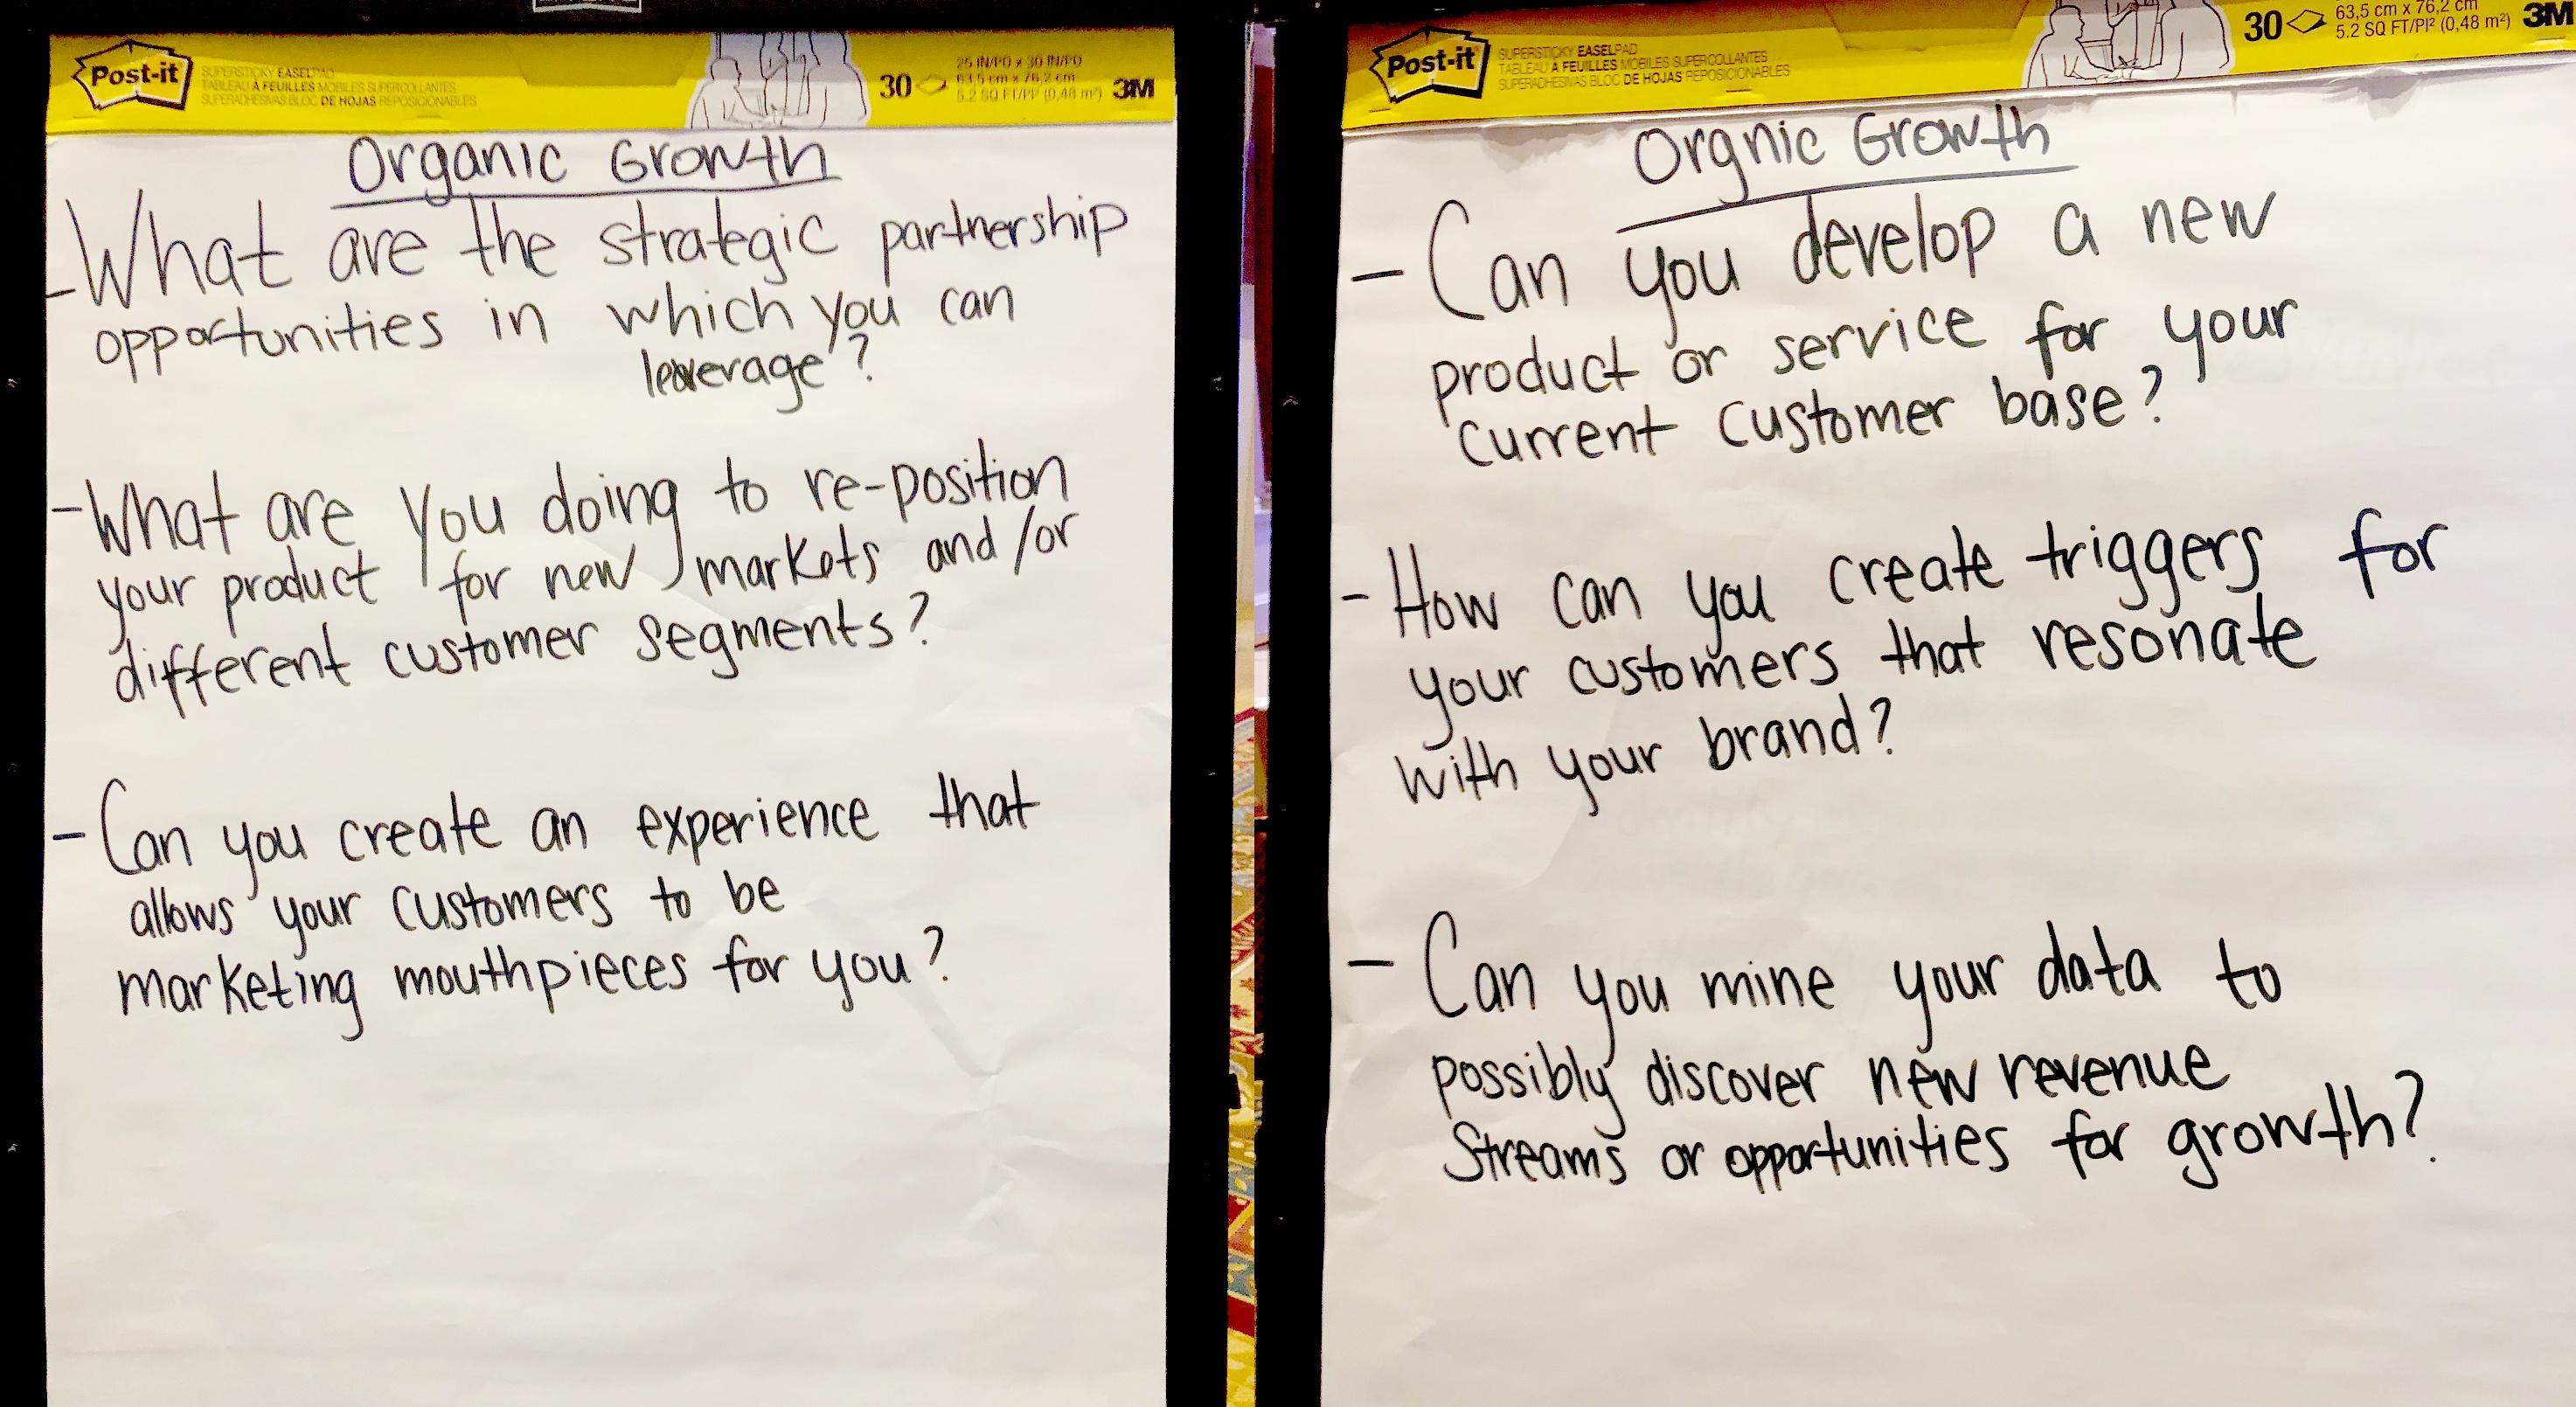 Organic-Growth-Ideas